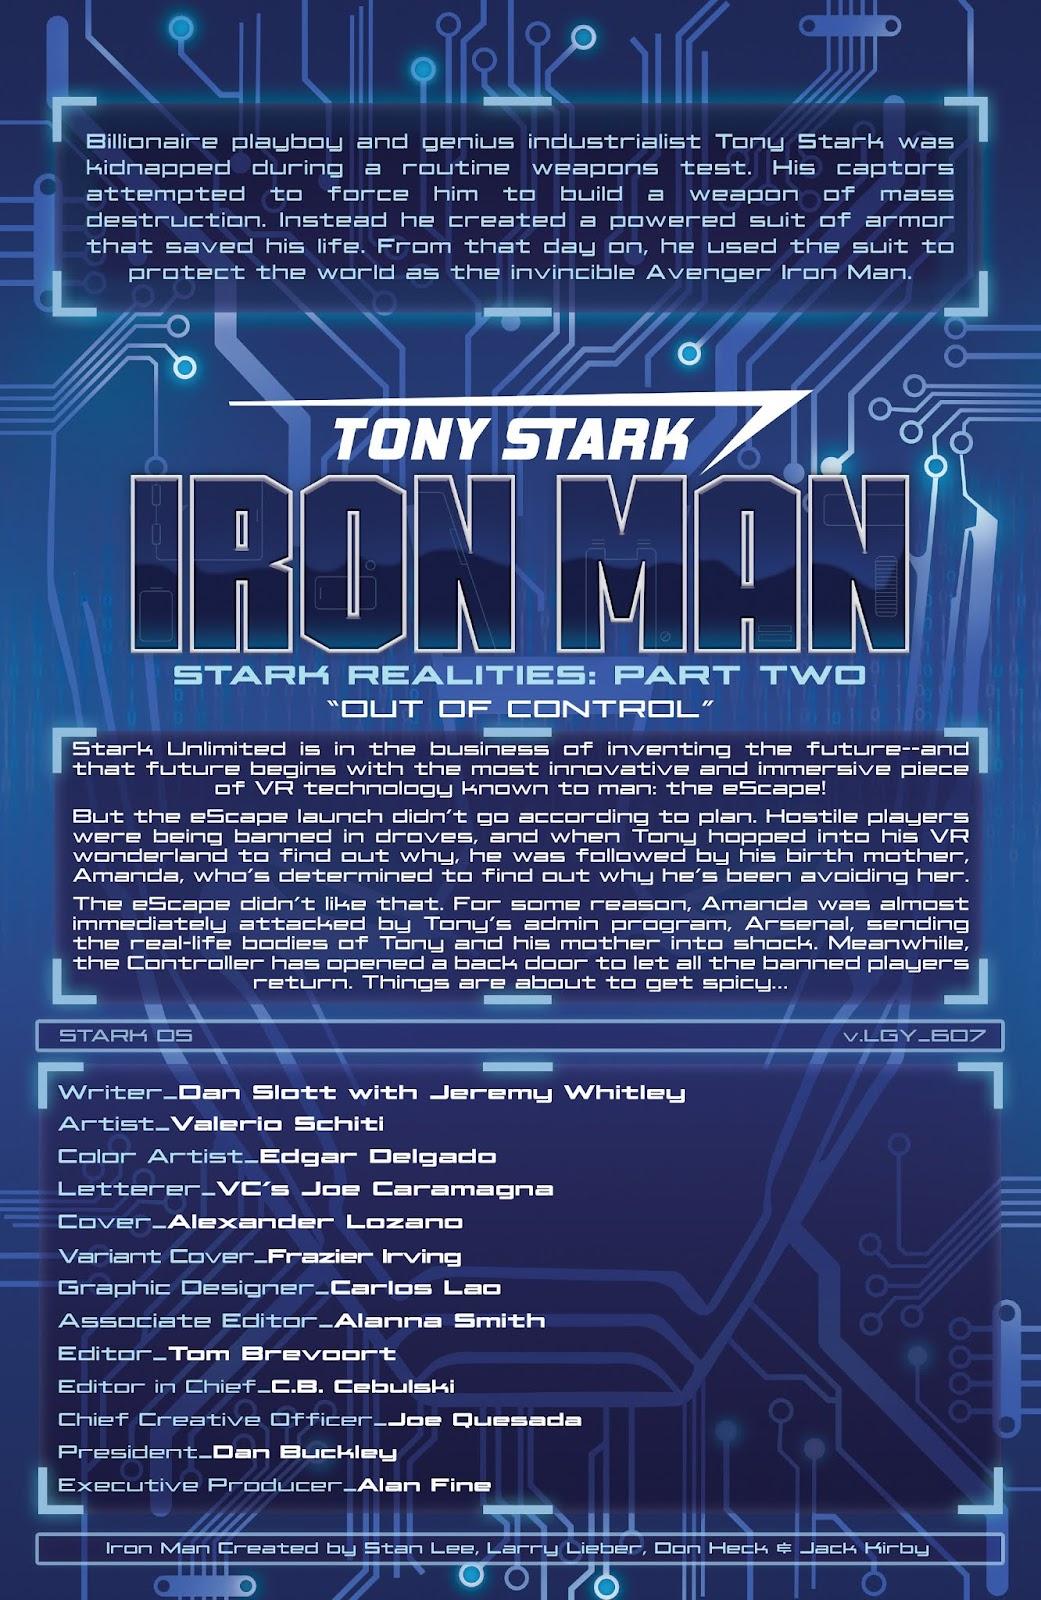 Read online Tony Stark: Iron Man comic -  Issue #7 - 4